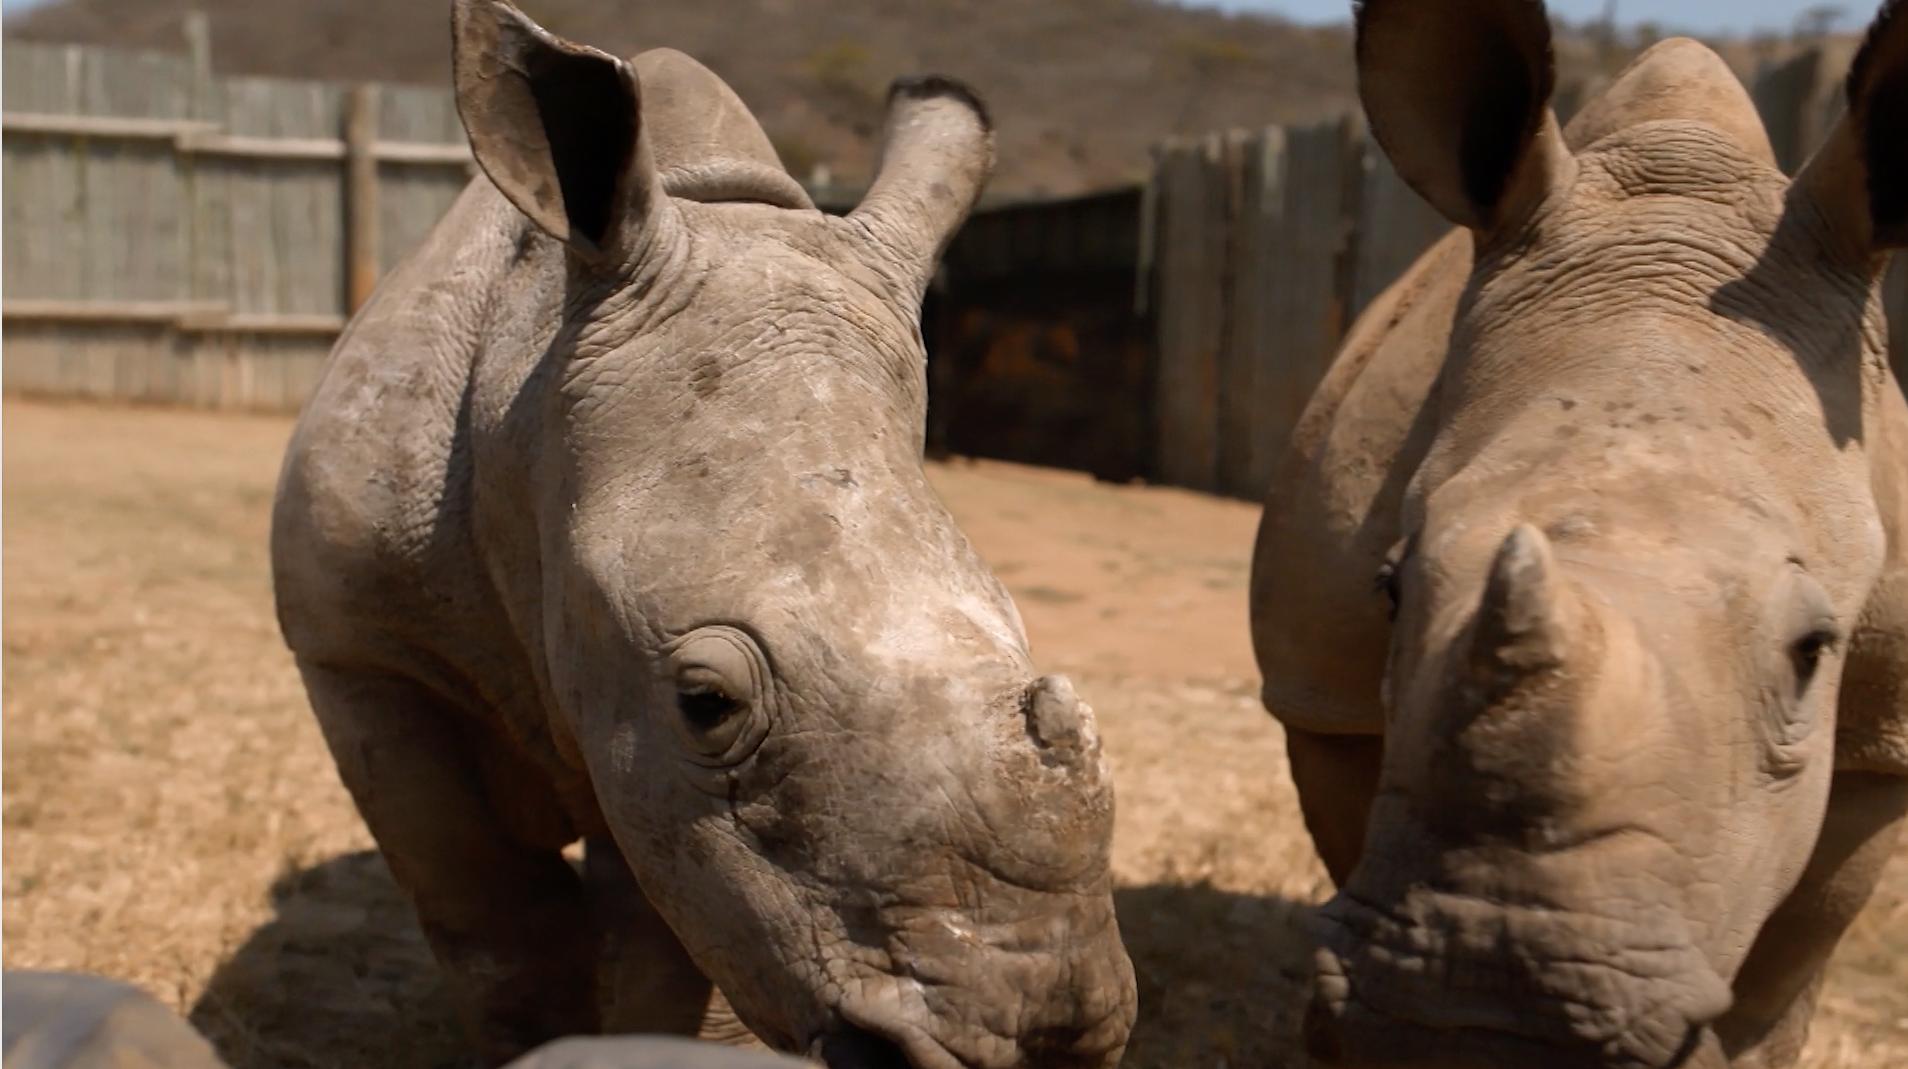 Save This Rhino